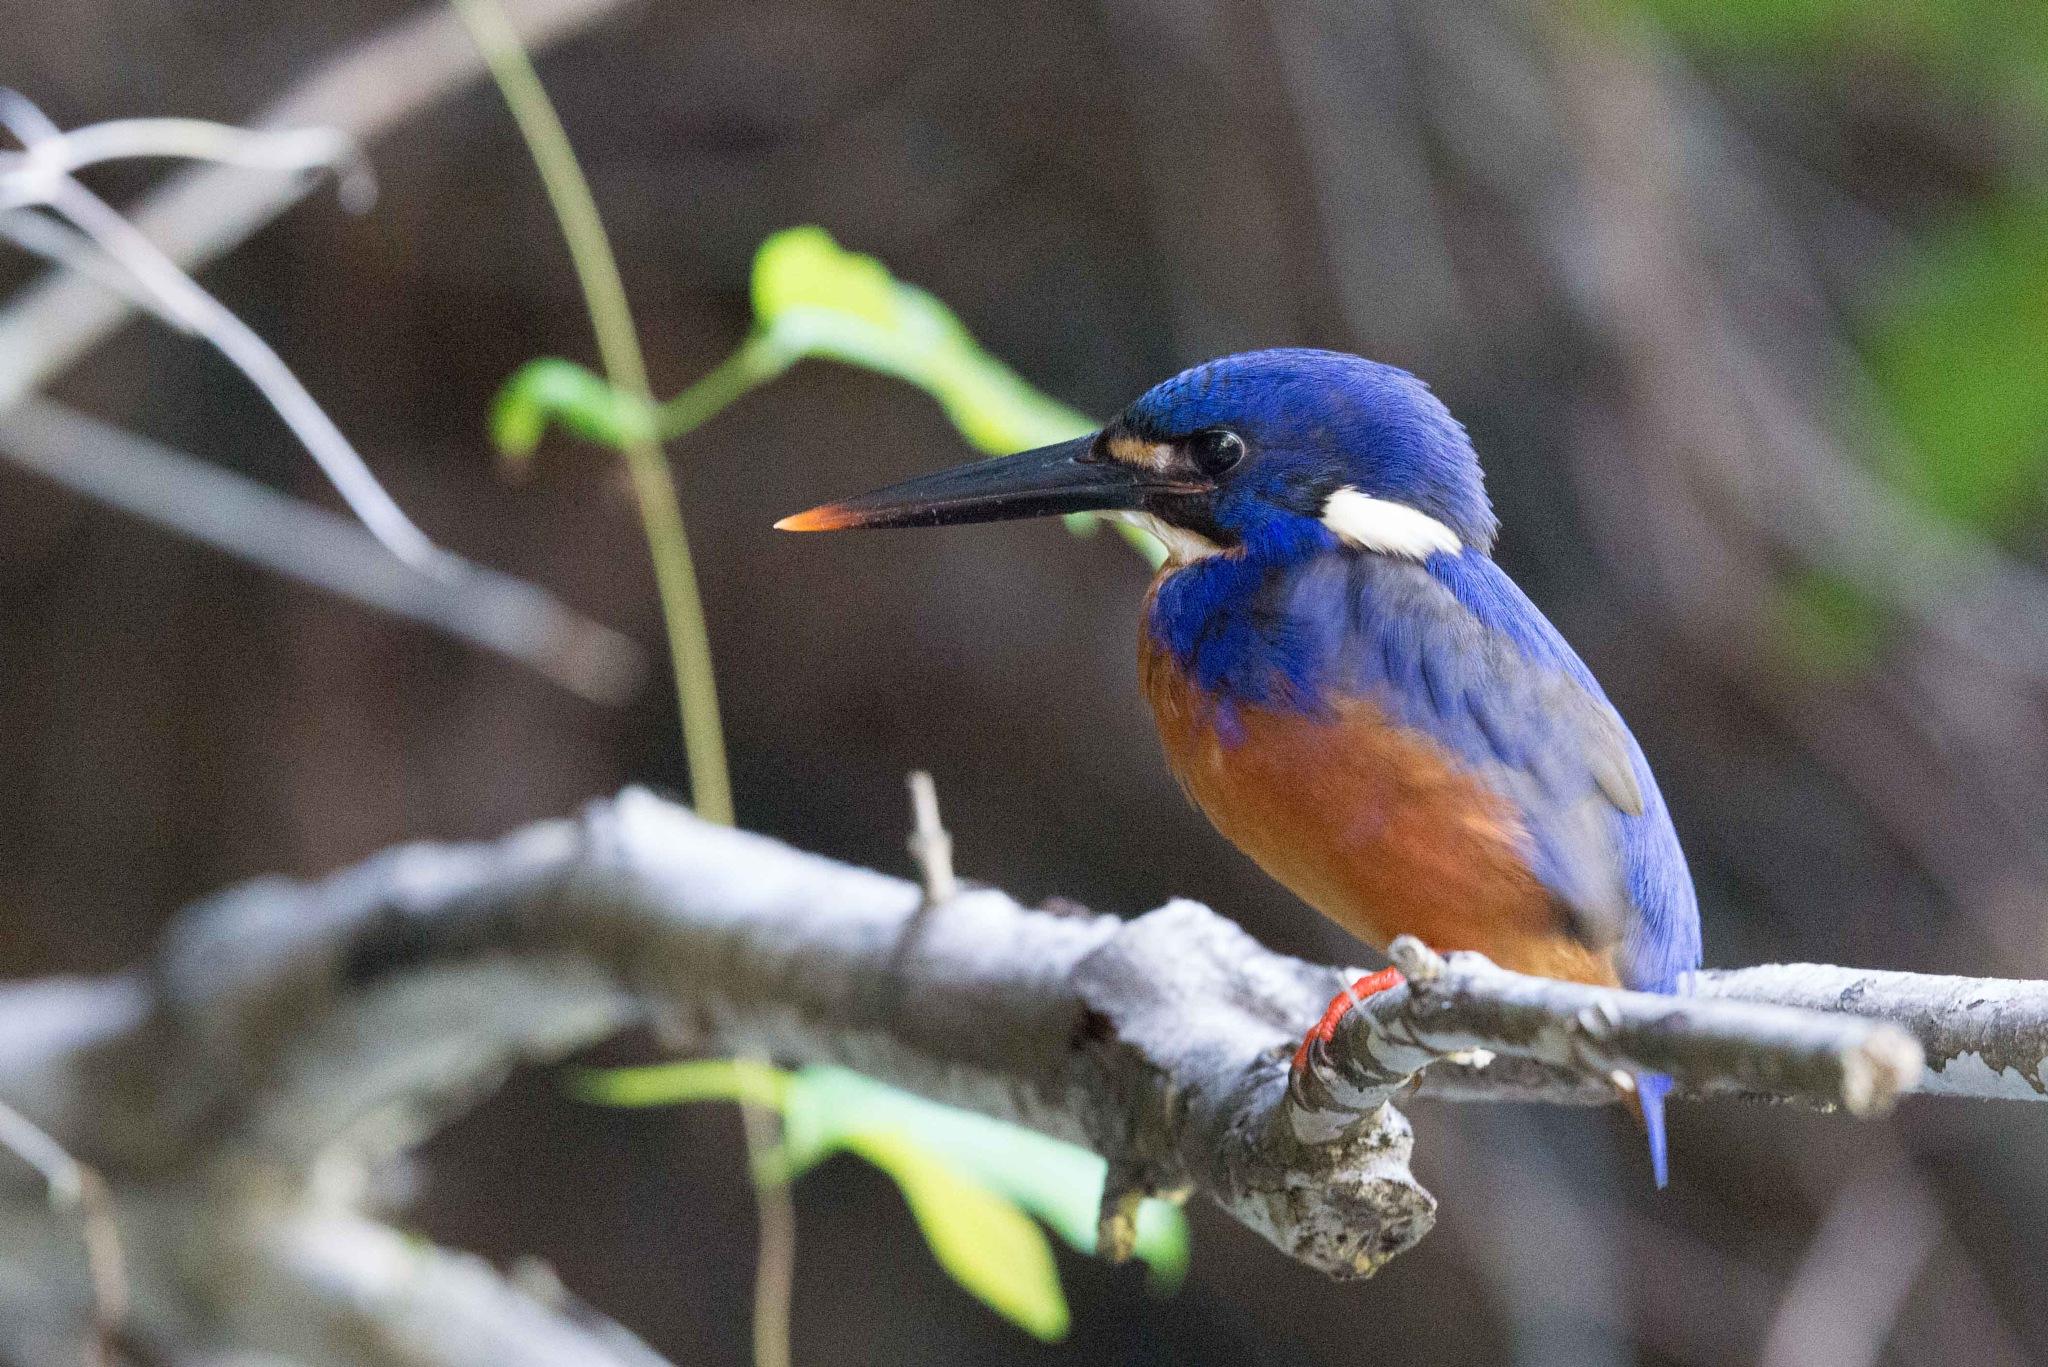 Azure Kingfisher by chrisgnixon